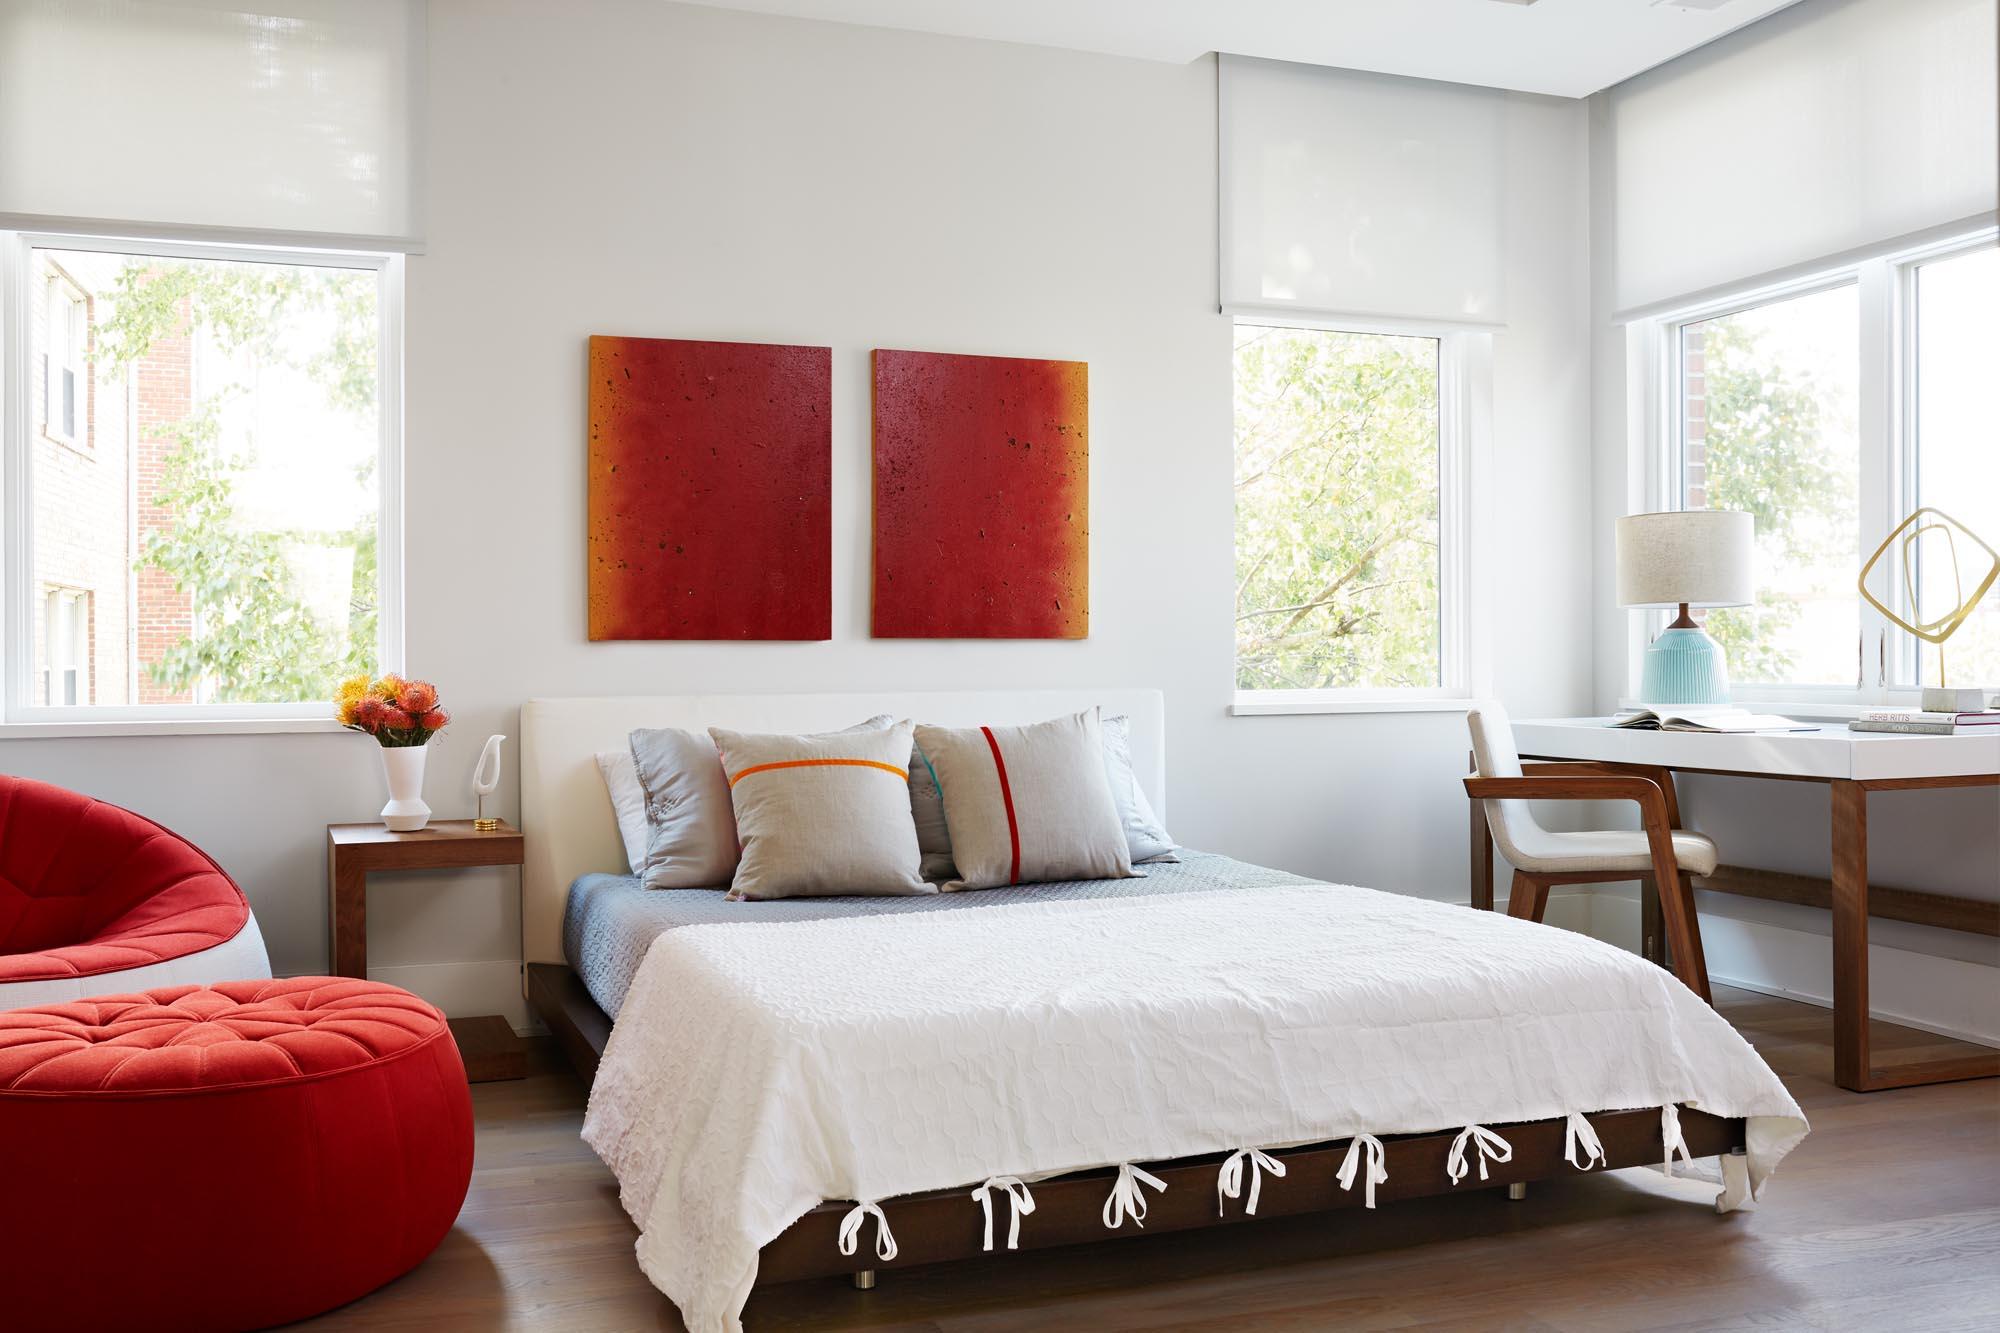 11-Kalorama-Triangle-Master-Bedroom-Boston-Interior-Designer-Dane-Austin-Design.jpg